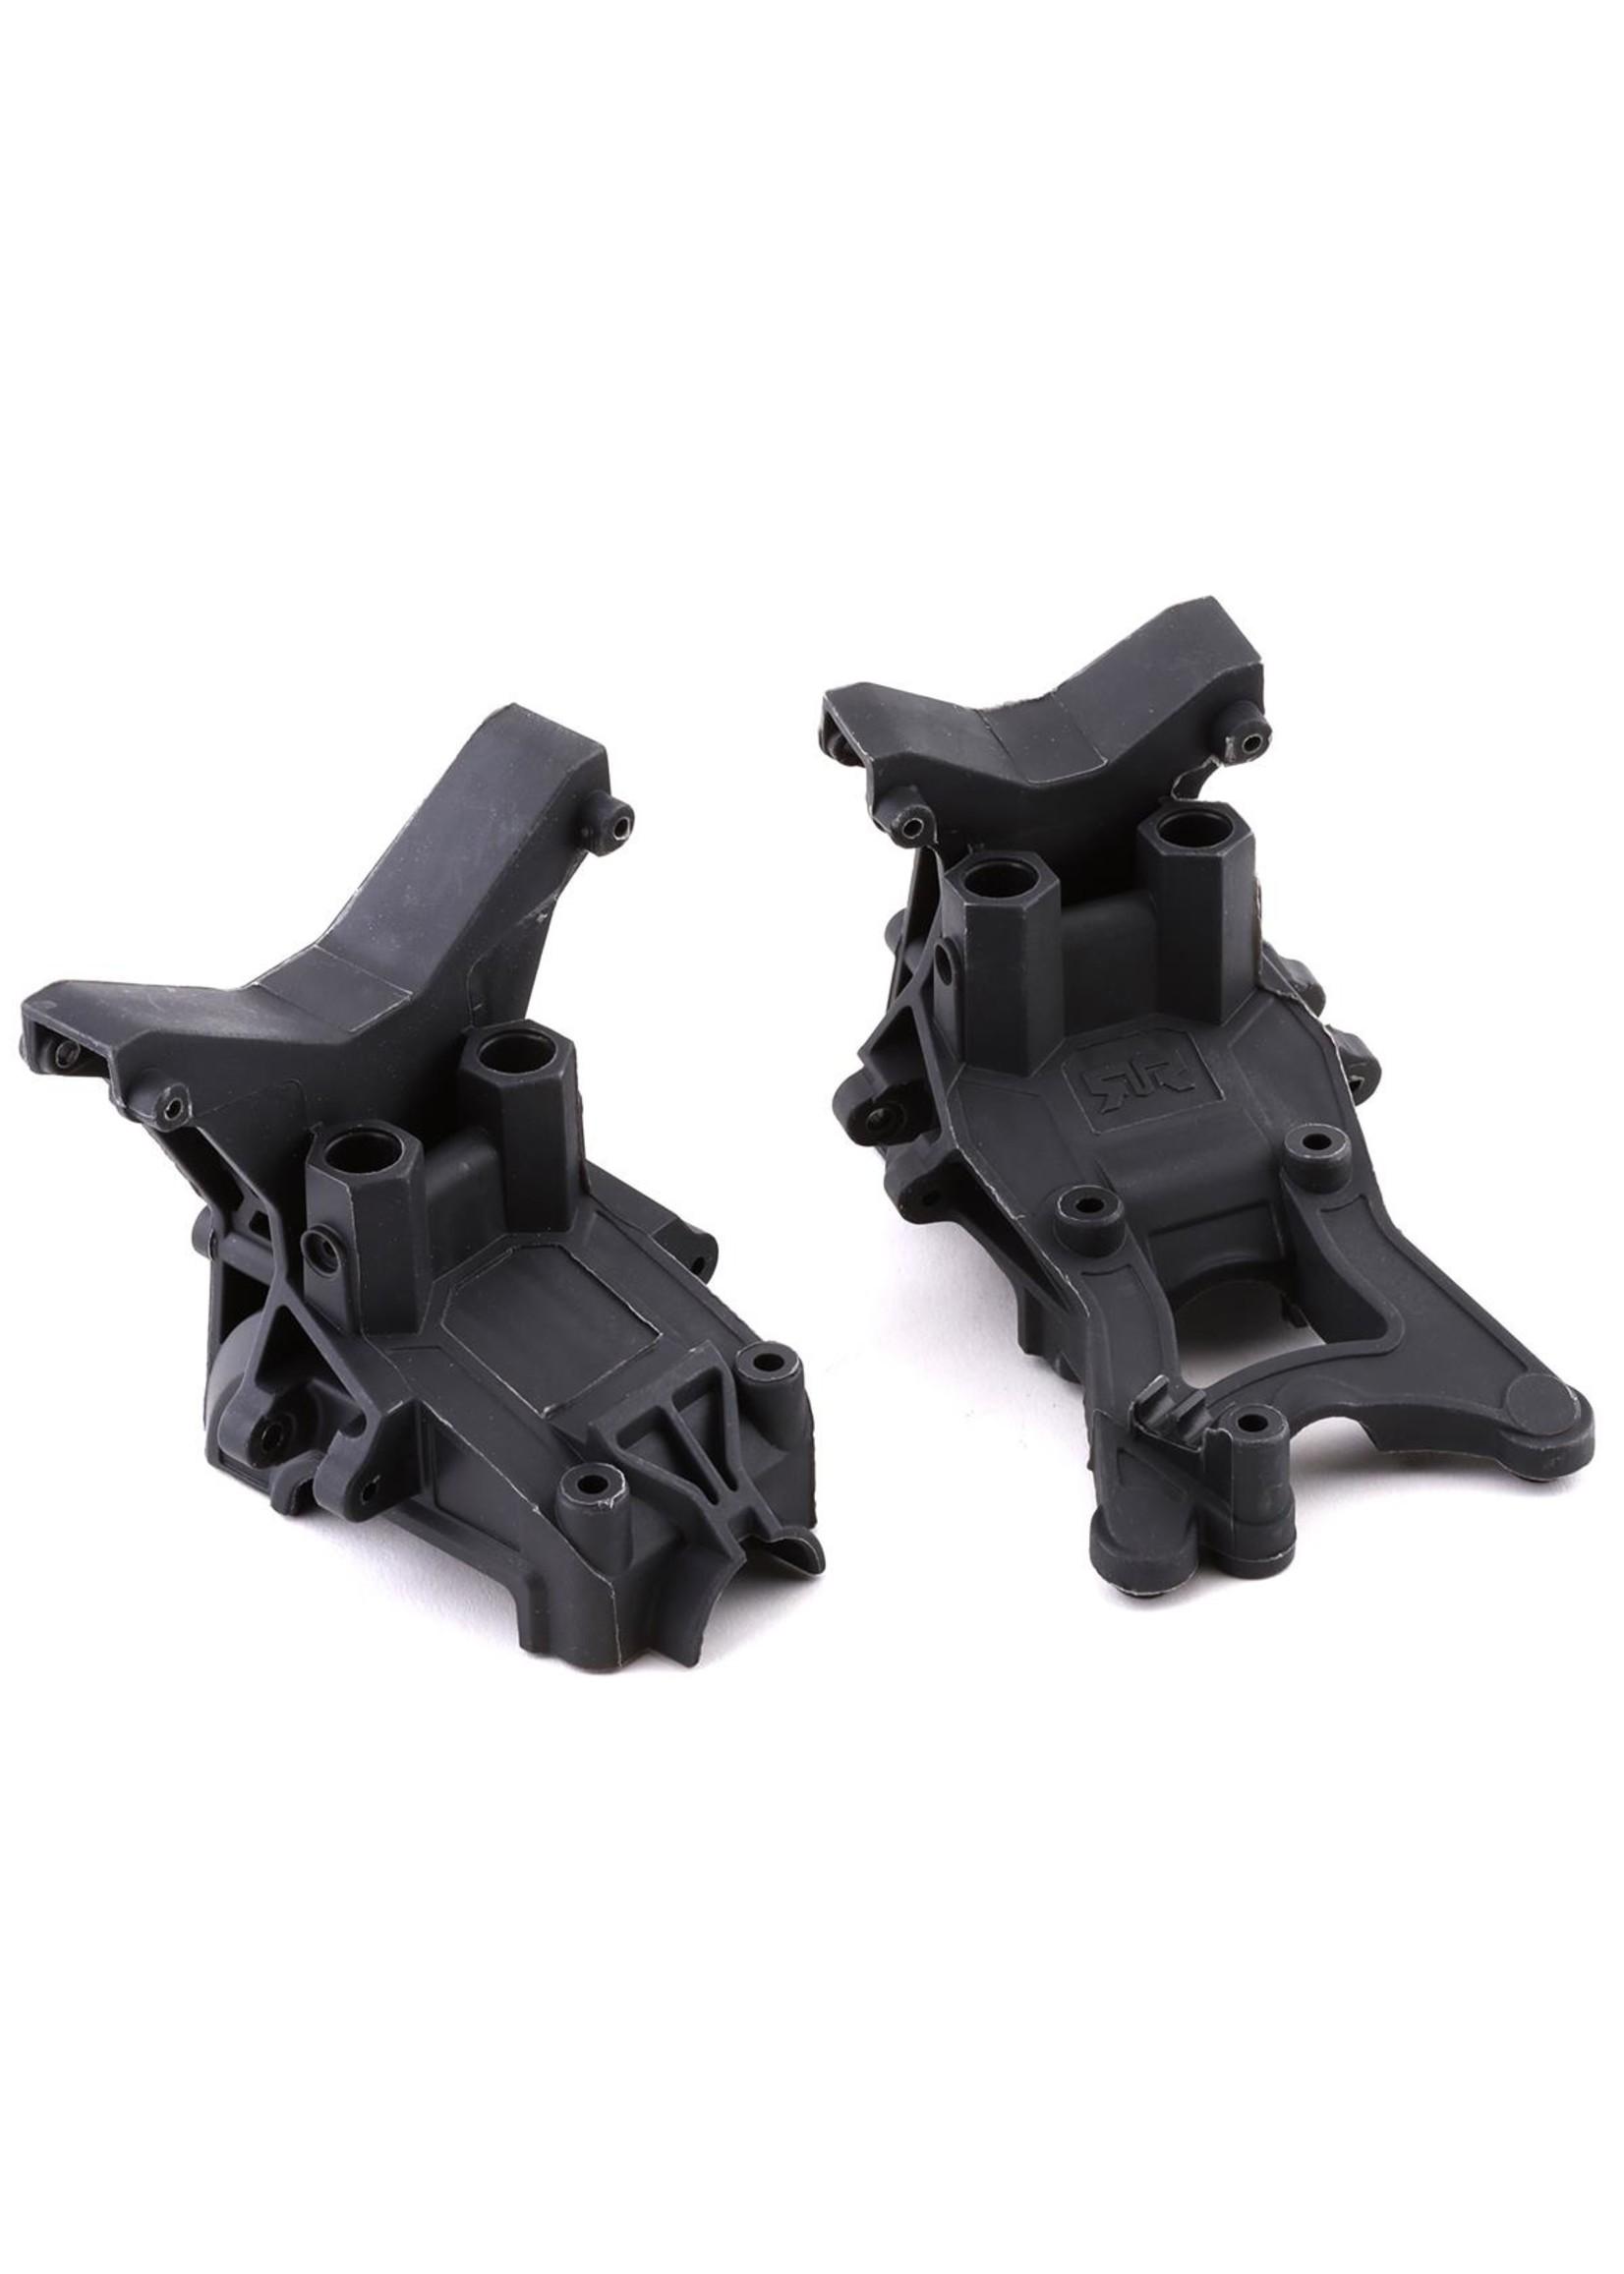 ARRMA AR320399 Arrma F/R Composite Upper Gearbox Cvr/Shock Twr